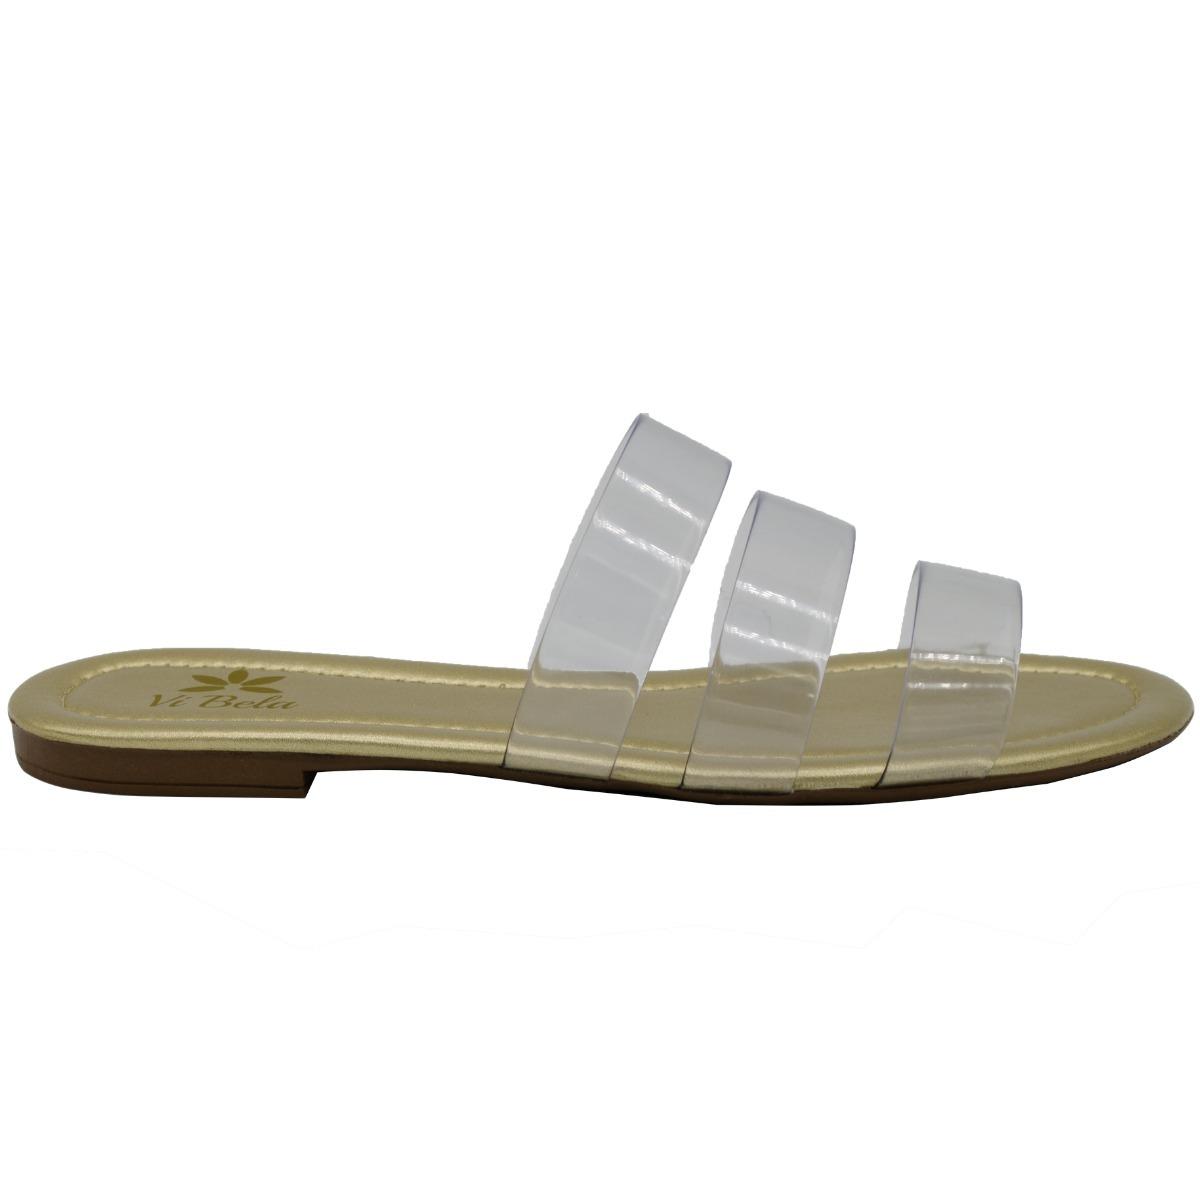 ddfc97b7a2 chinelo feminino sandalia chinela rasteirinha tamanco flat. Carregando zoom.